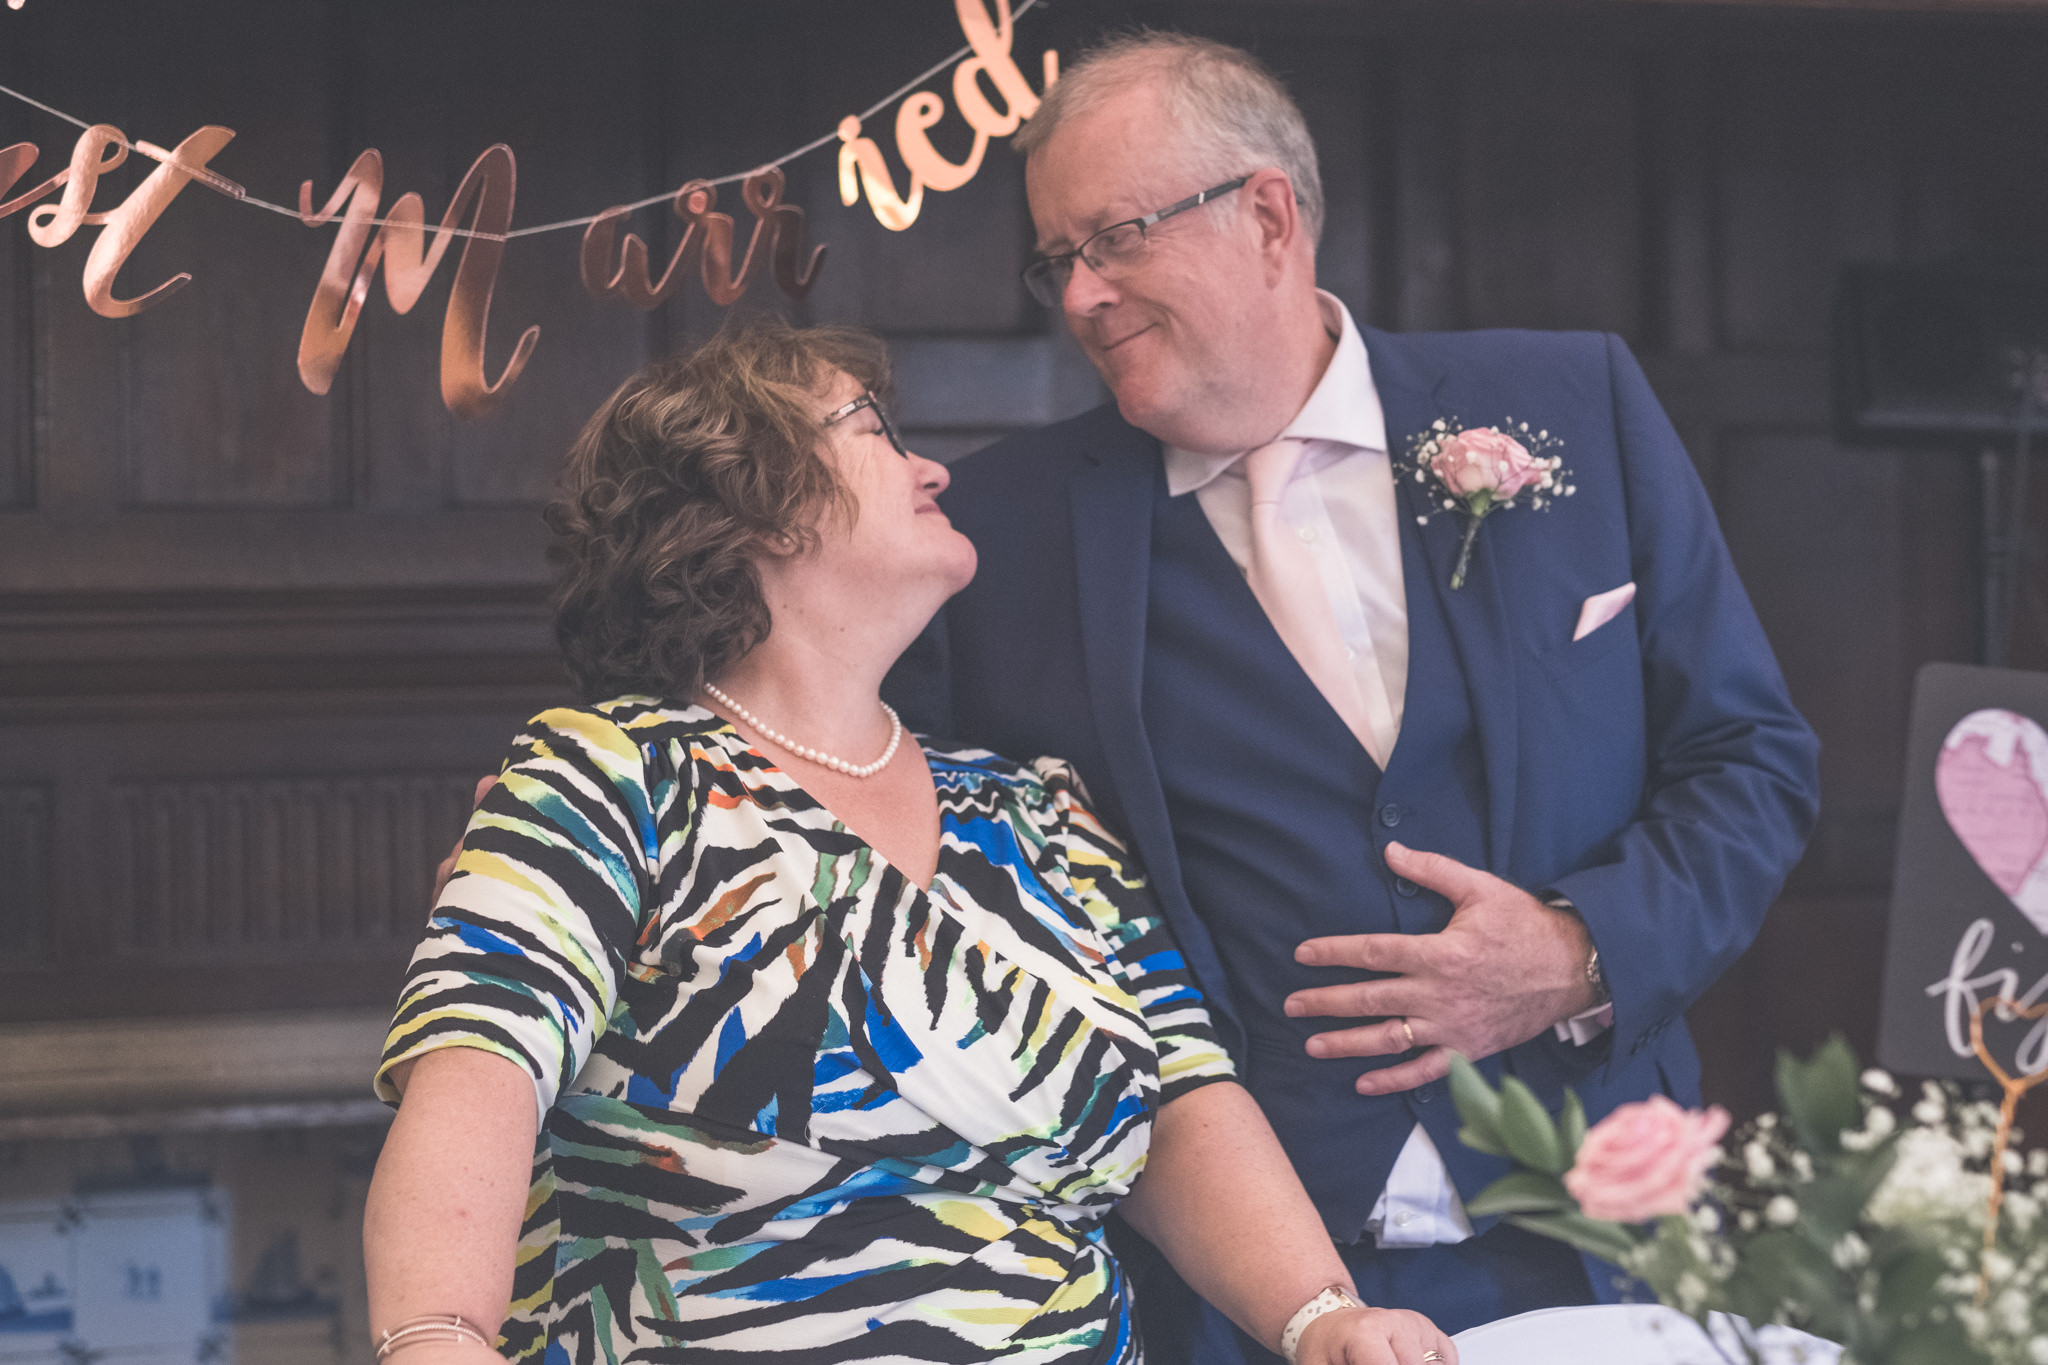 Woldingham School Wedding - Robin Ball Photography - Kate and Lee-043.jpg